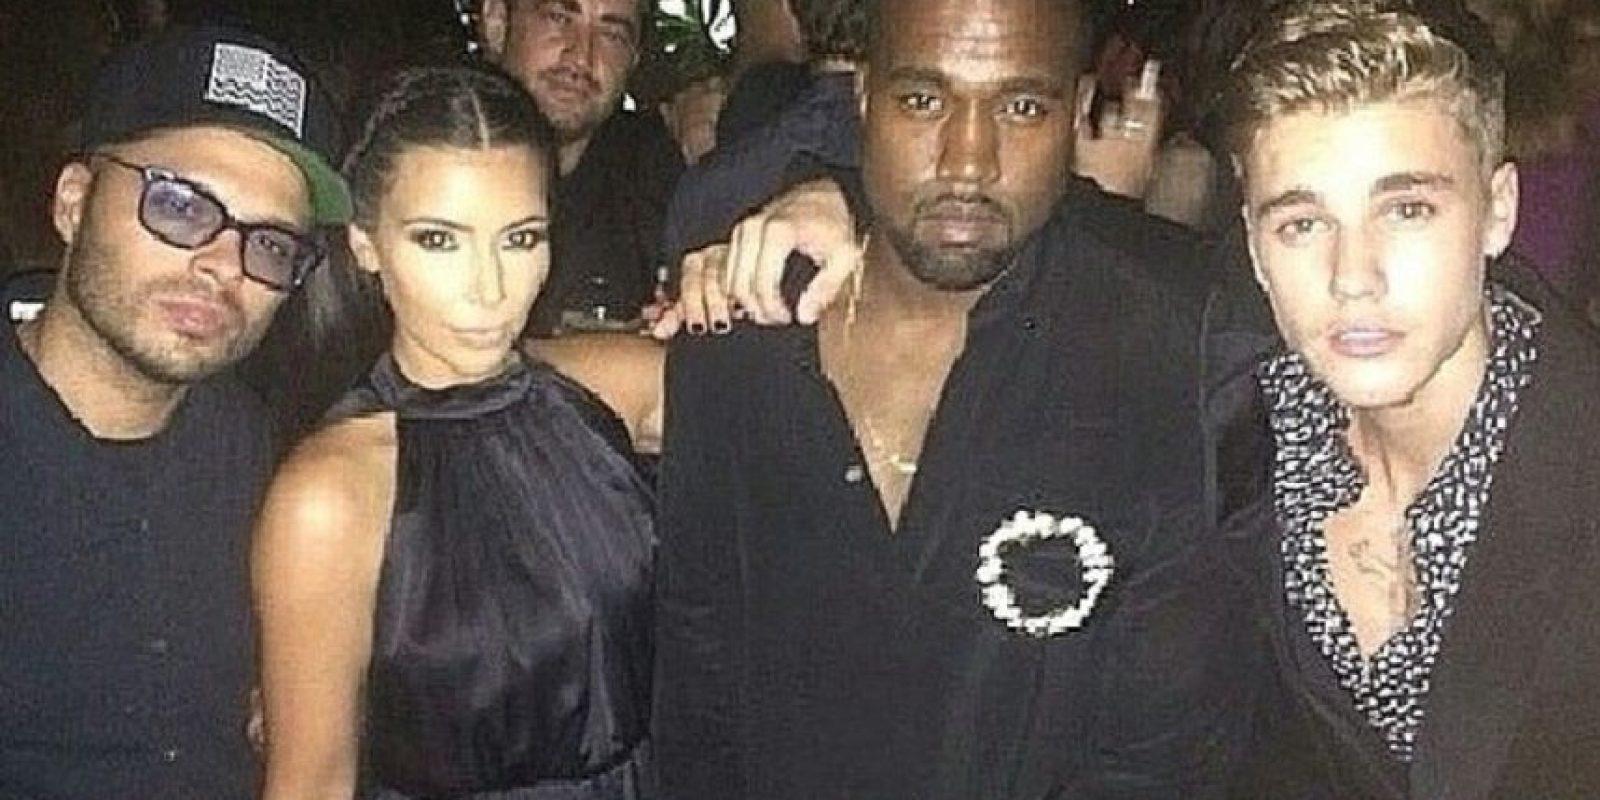 Kanye West y Kim Kardashian Foto:Instagram: @justinbieber